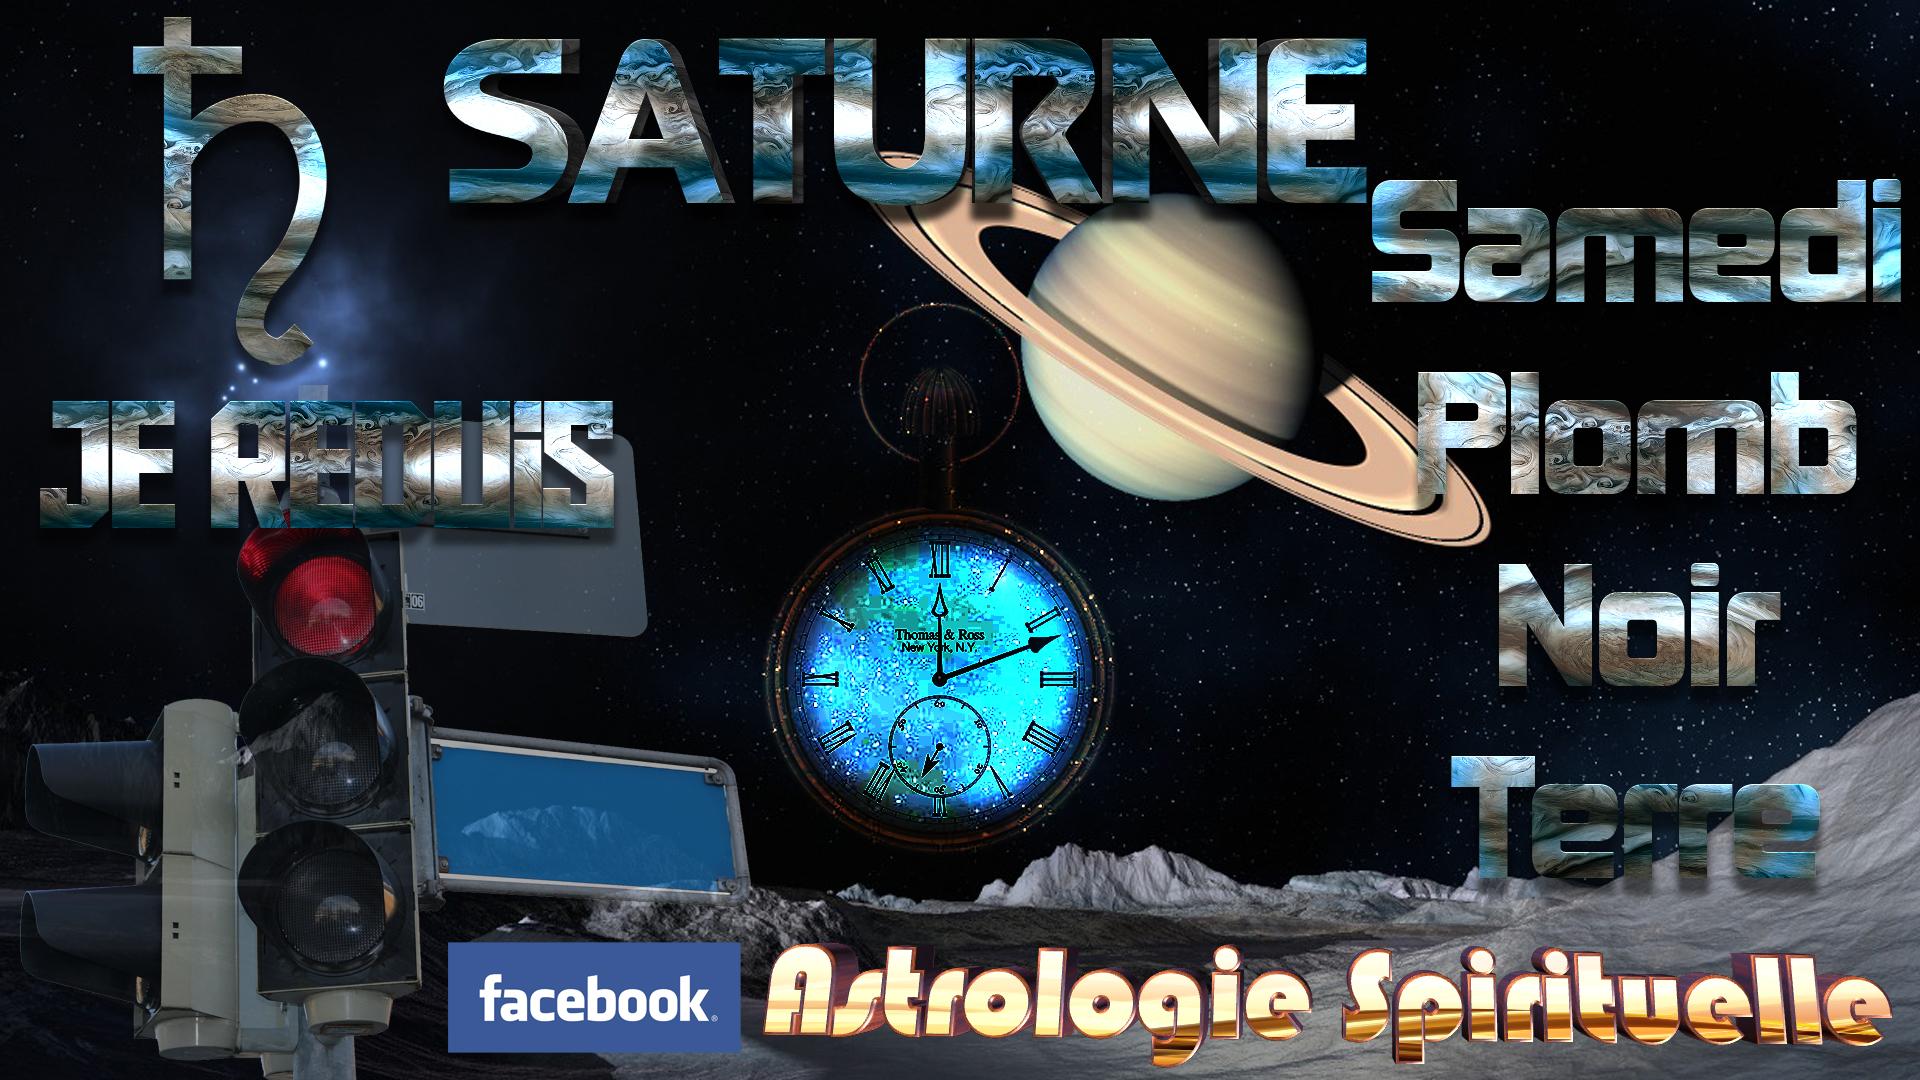 Saturne c'est le samedi